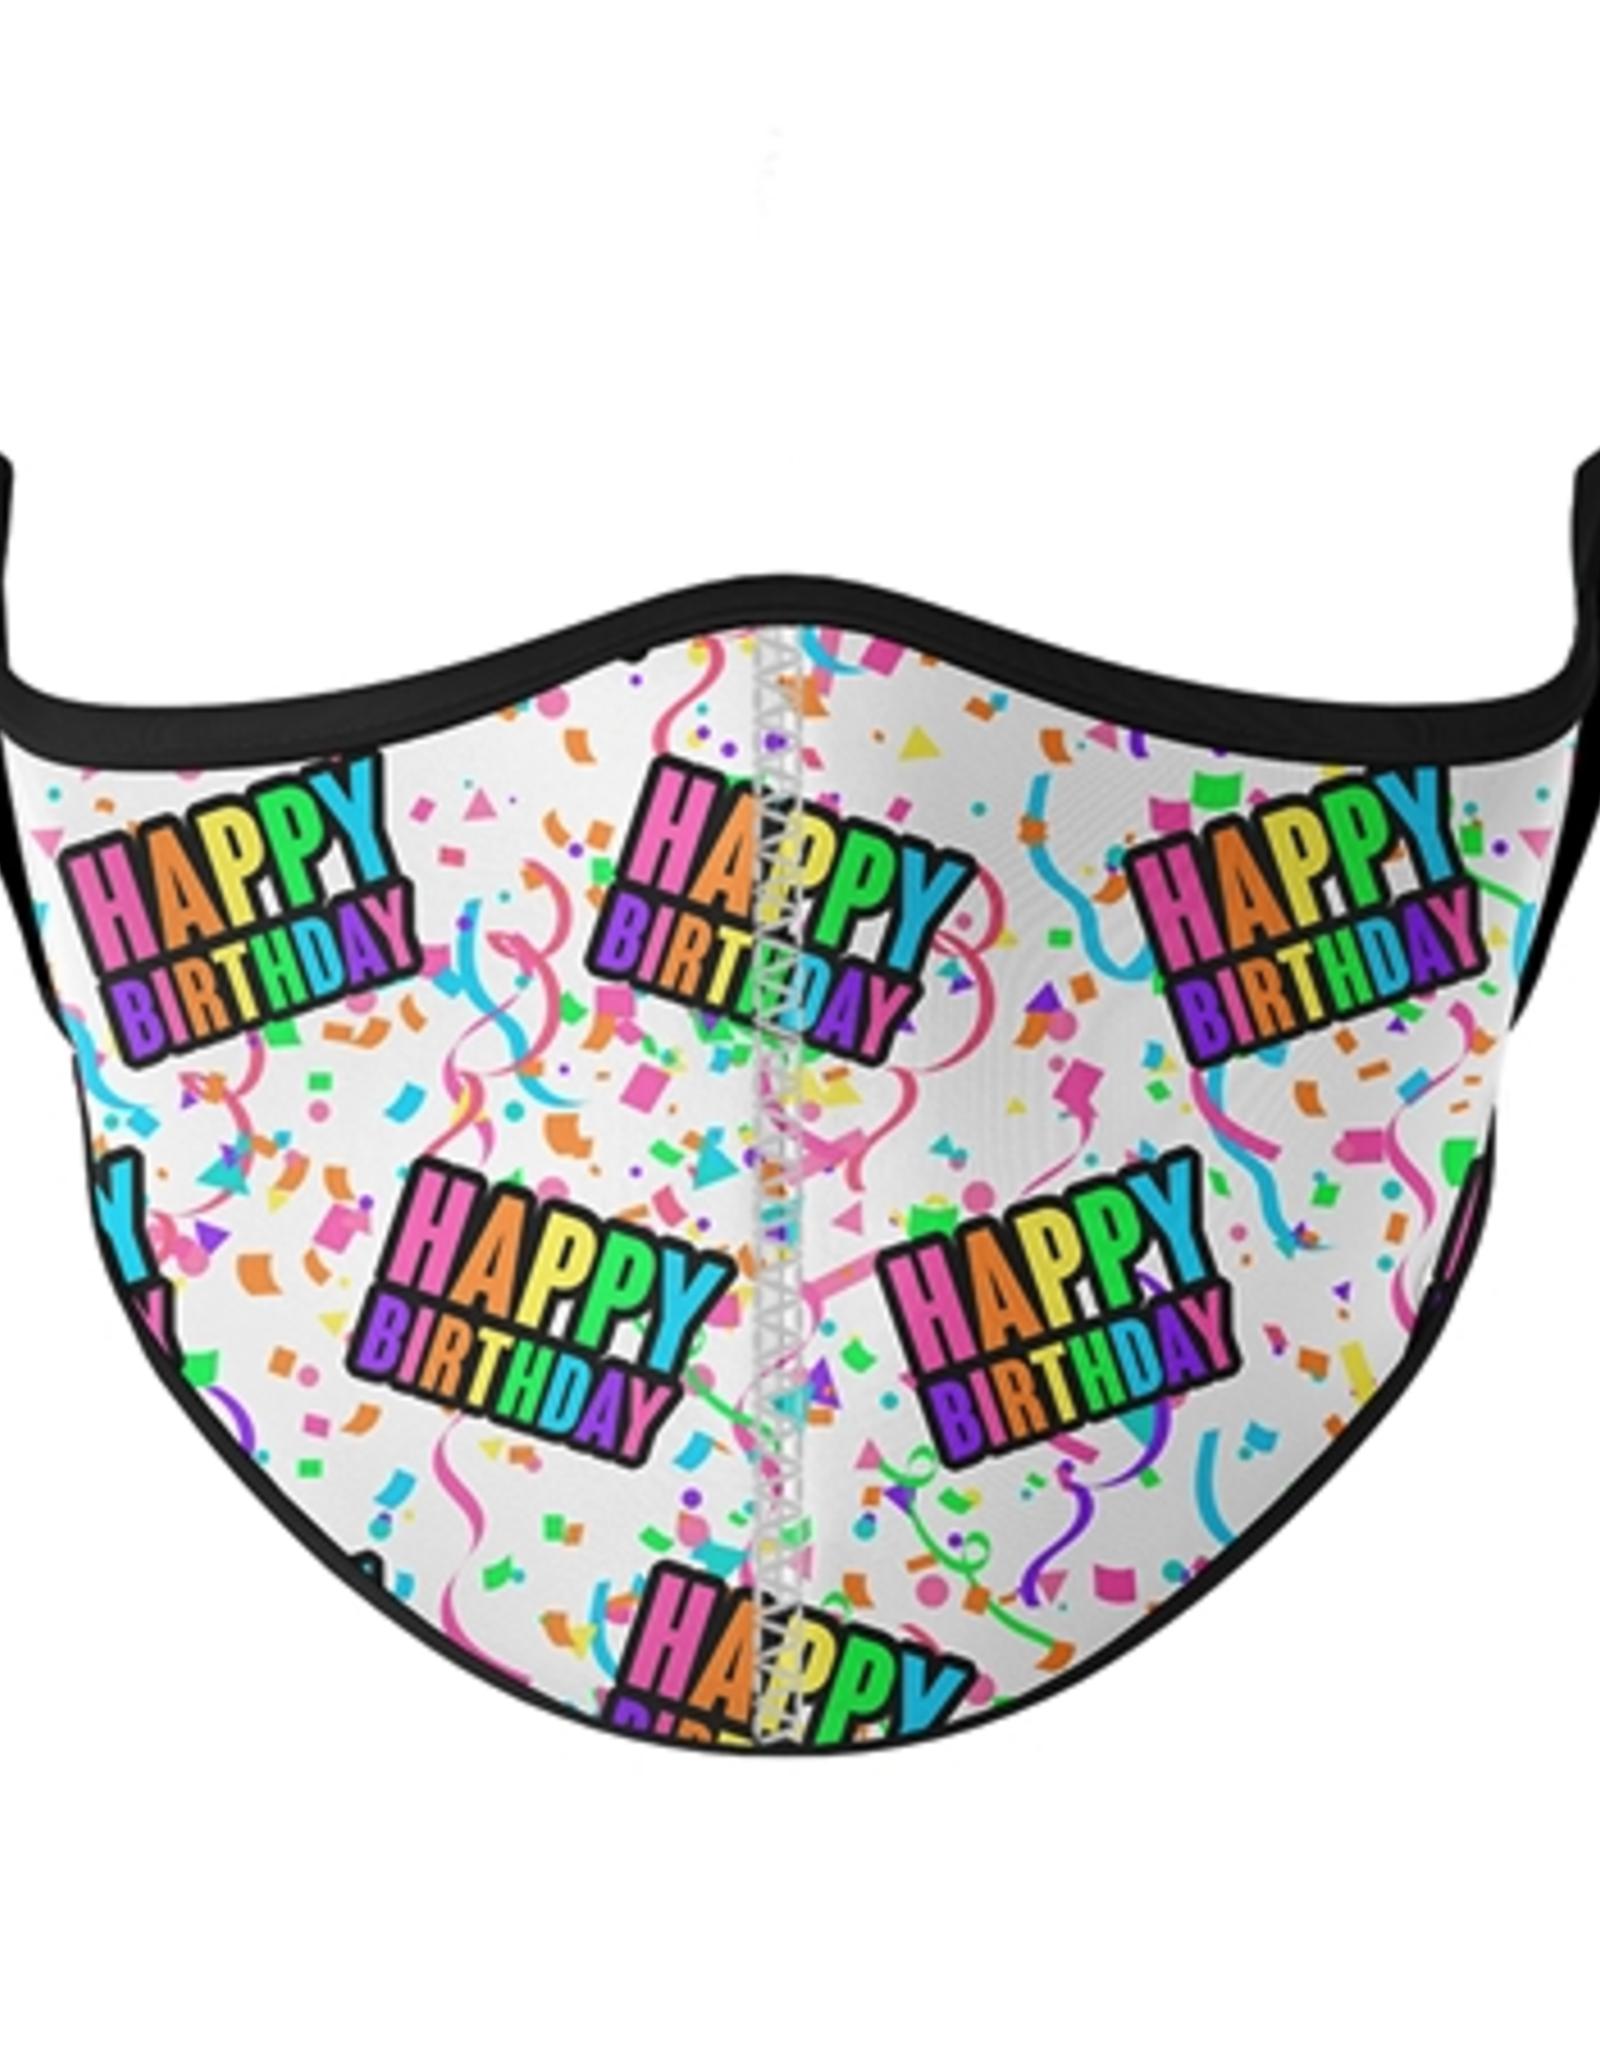 Top Trenz Top Trenz - Small Size - Happy Birthday